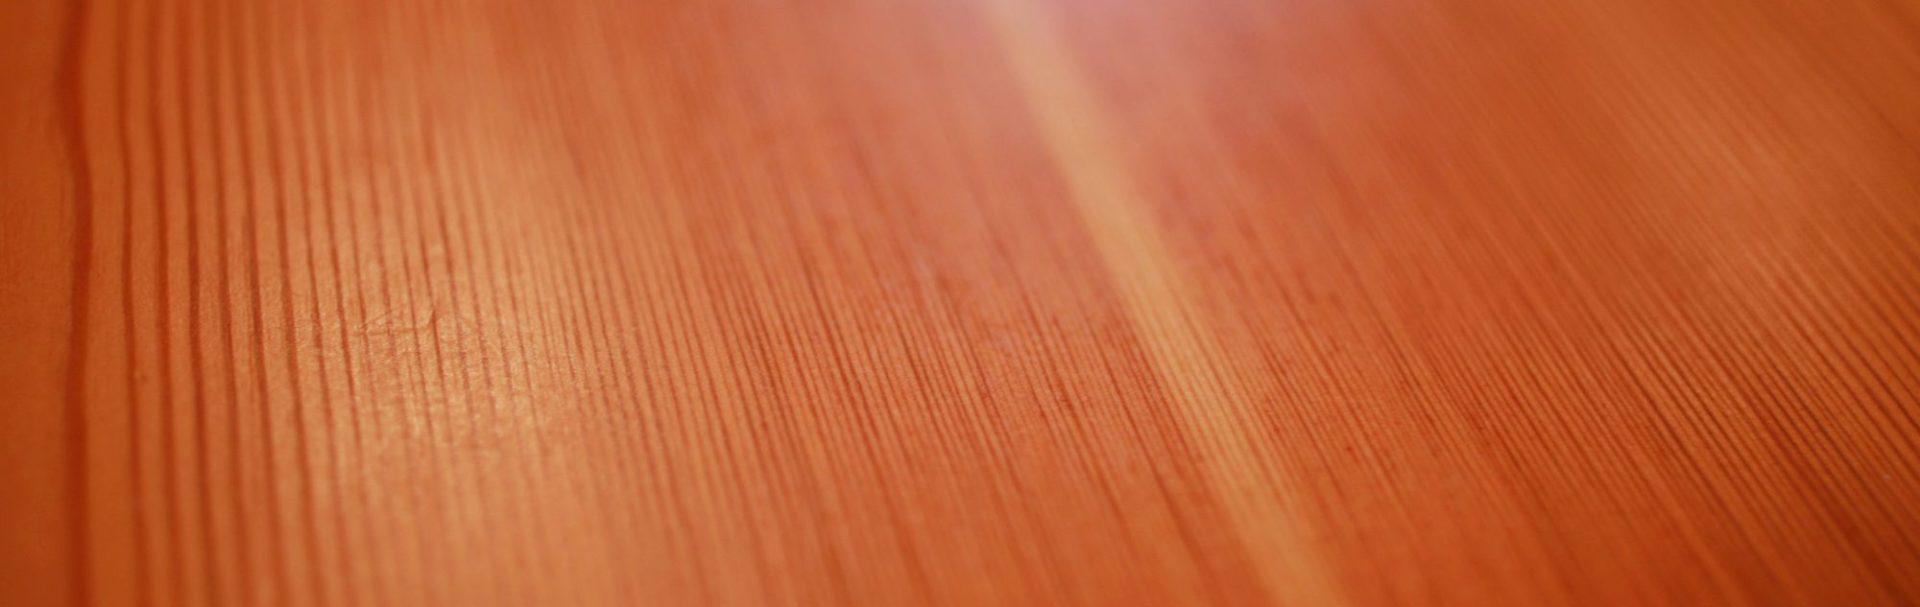 Heart Pine Flooring Flooring For Any Decor Appalachian